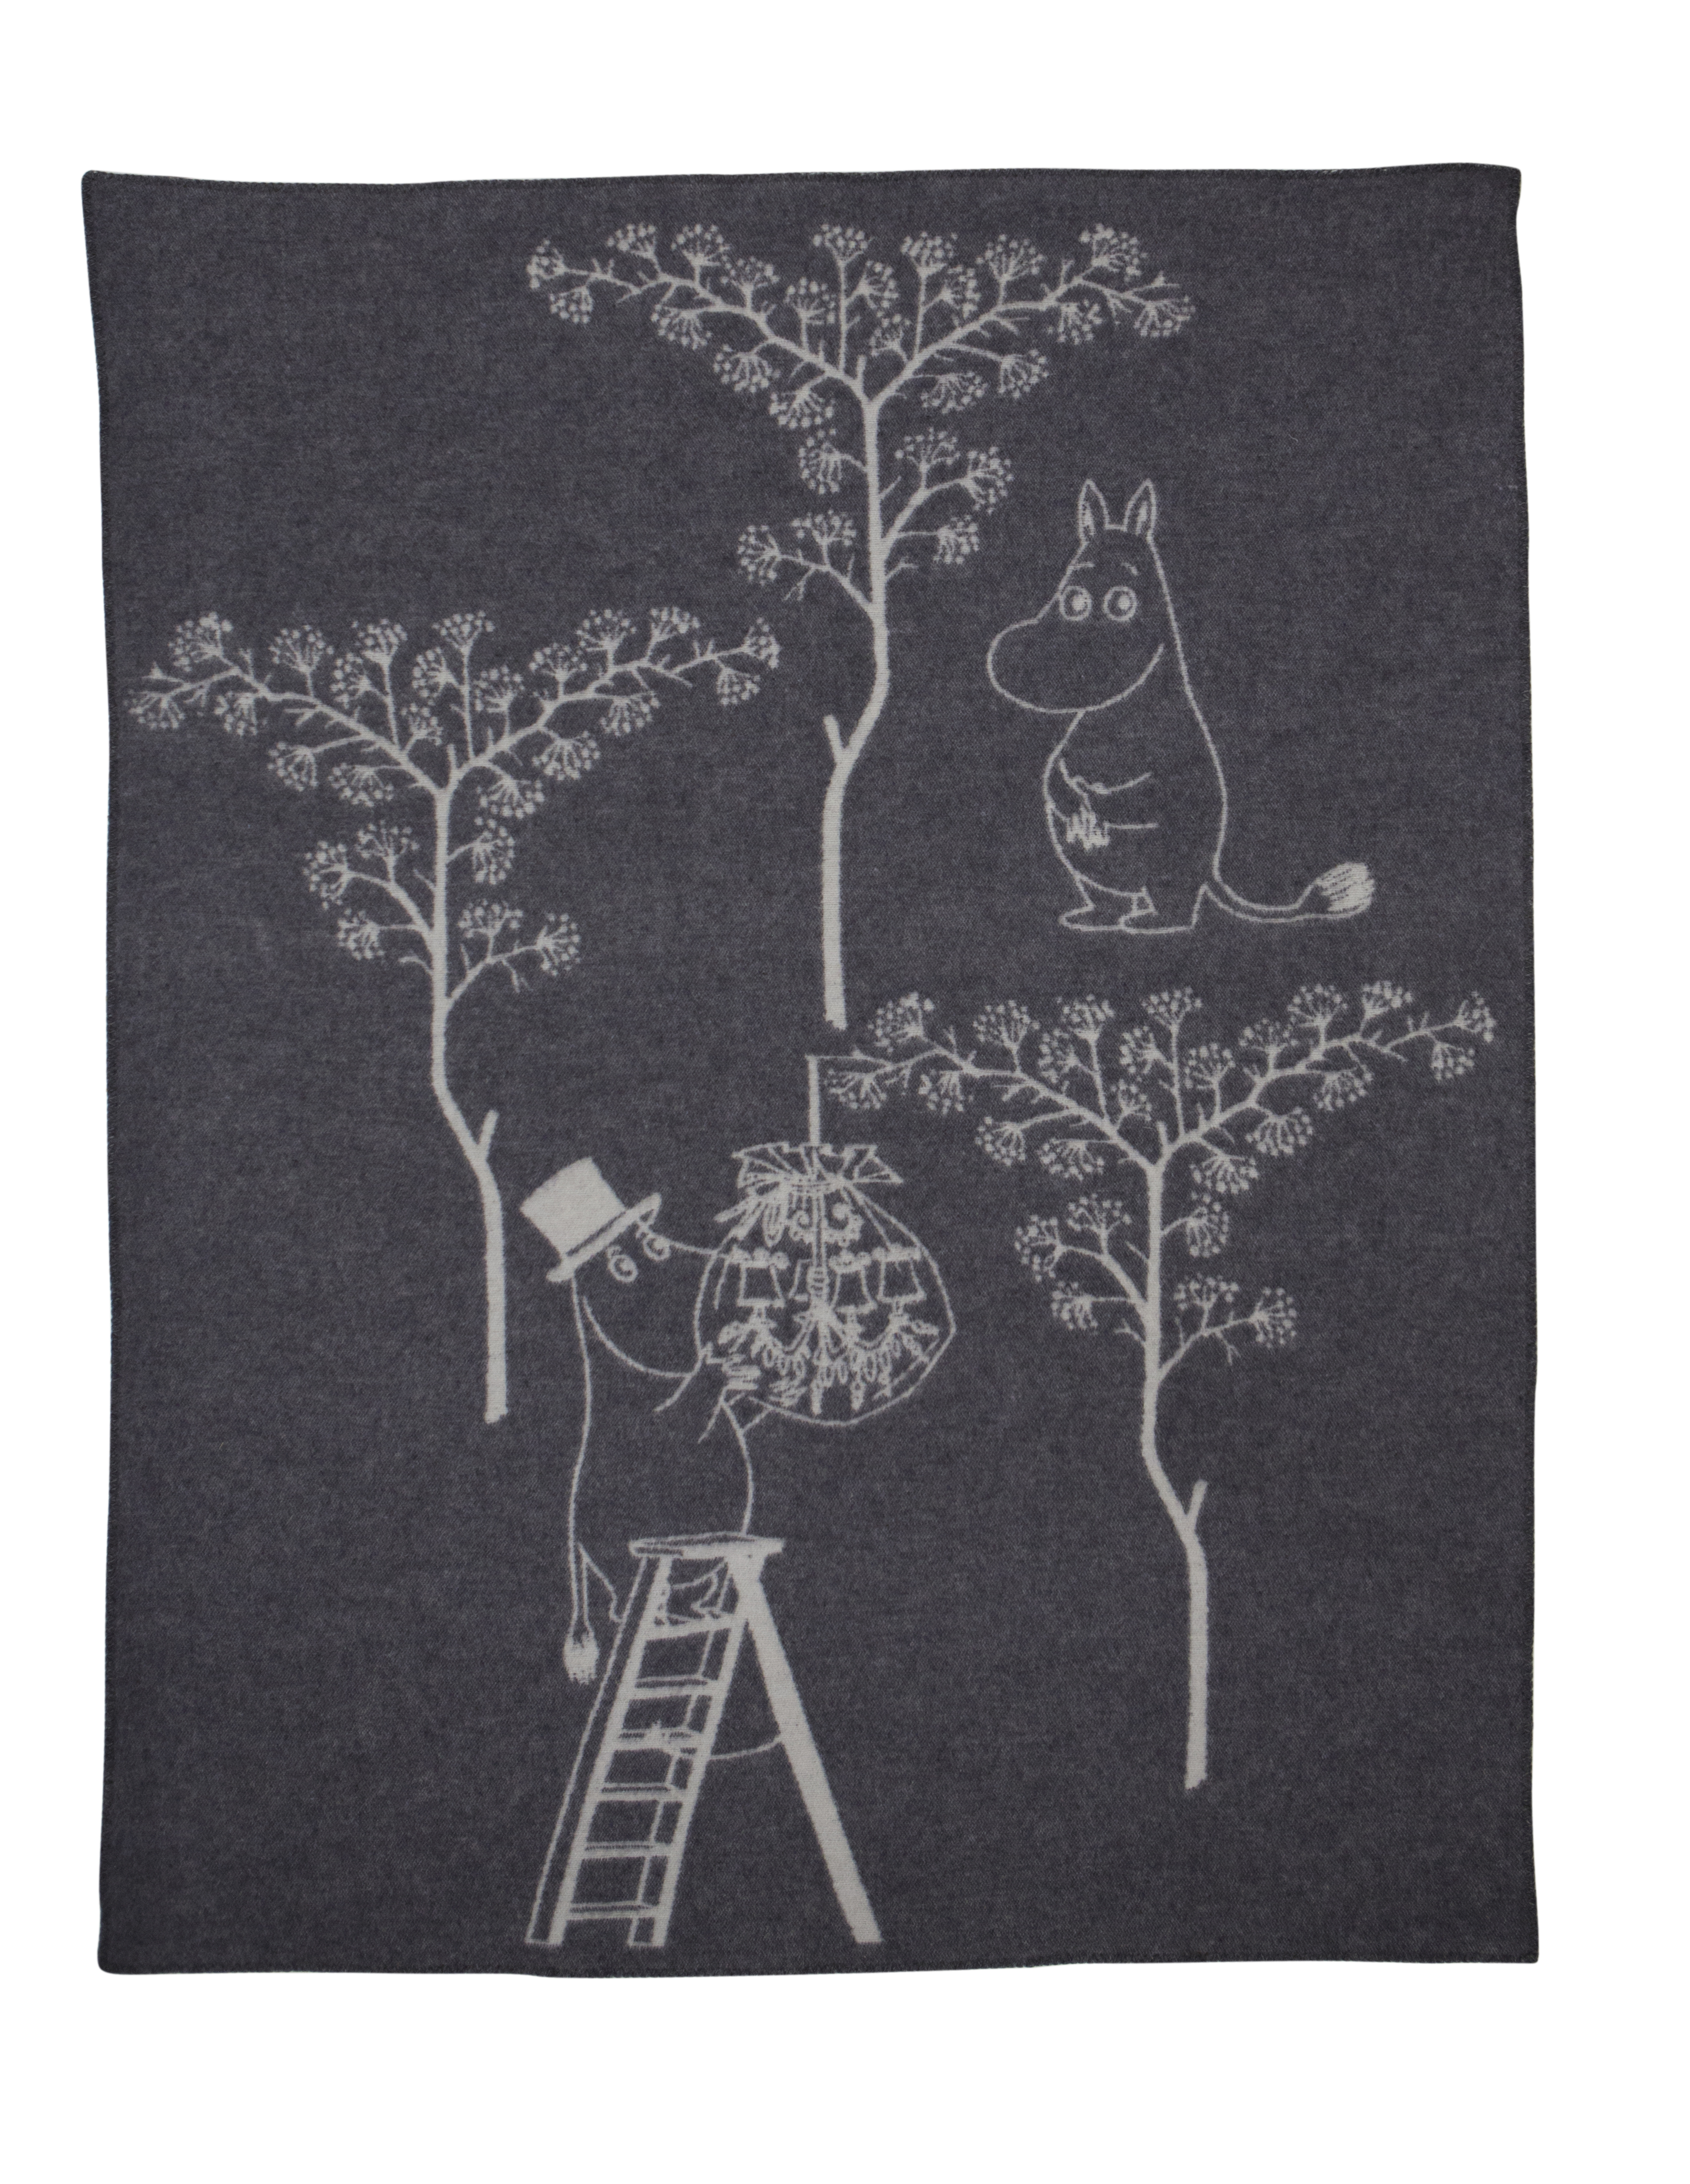 Turiform Moomin blanket